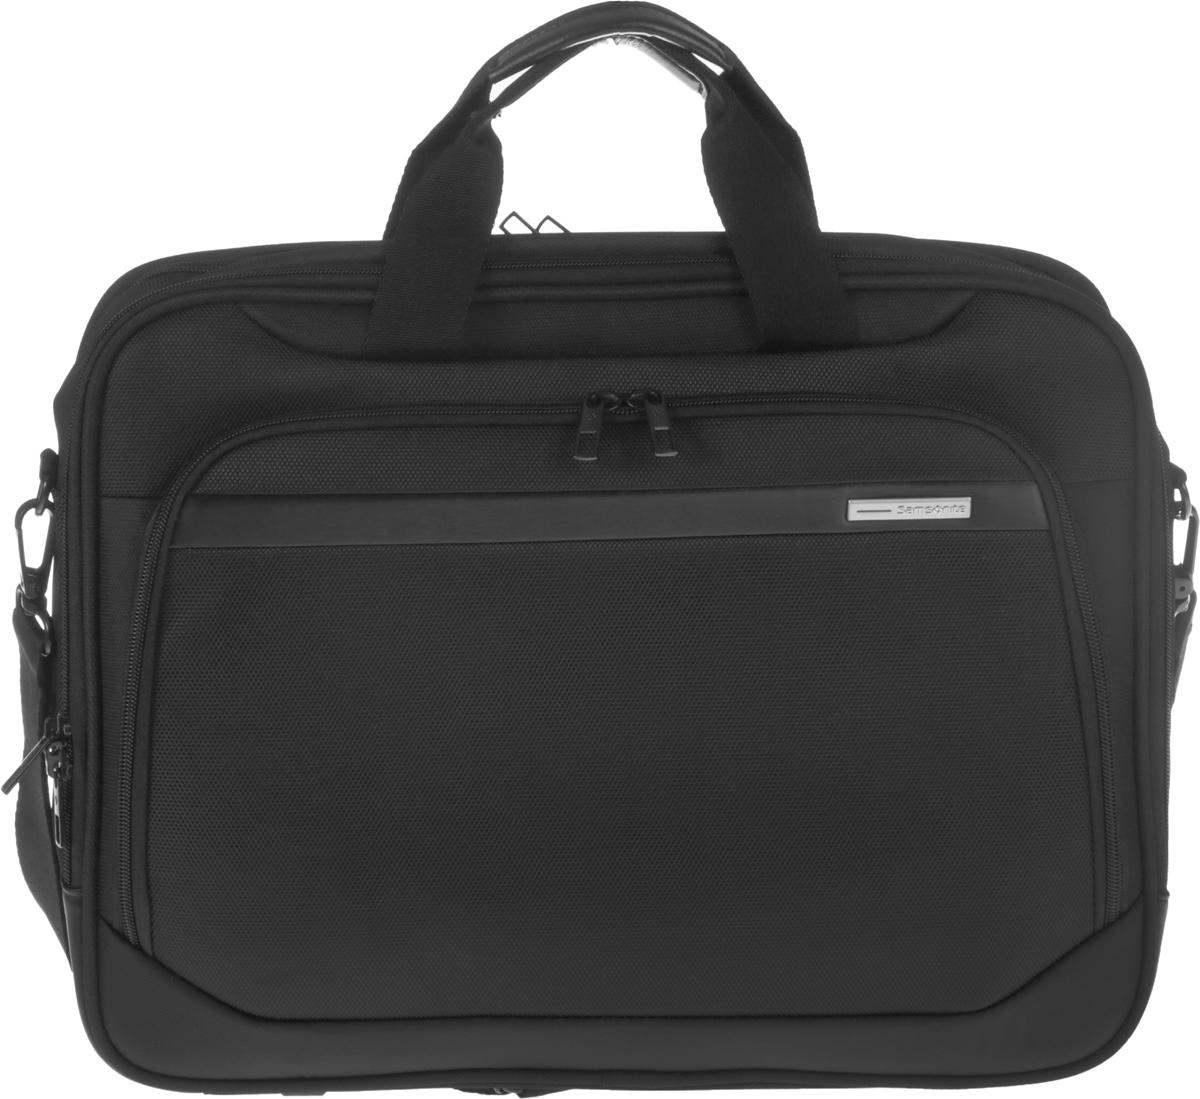 Сумка для ноутбука Samsonite GuardIt, цвет: черный, 43,5 х 33 х 13,5 см сумка для ноутбука samsonite сумка для ноутбука 17 3 vectura 45 5x38 5x13 5 см